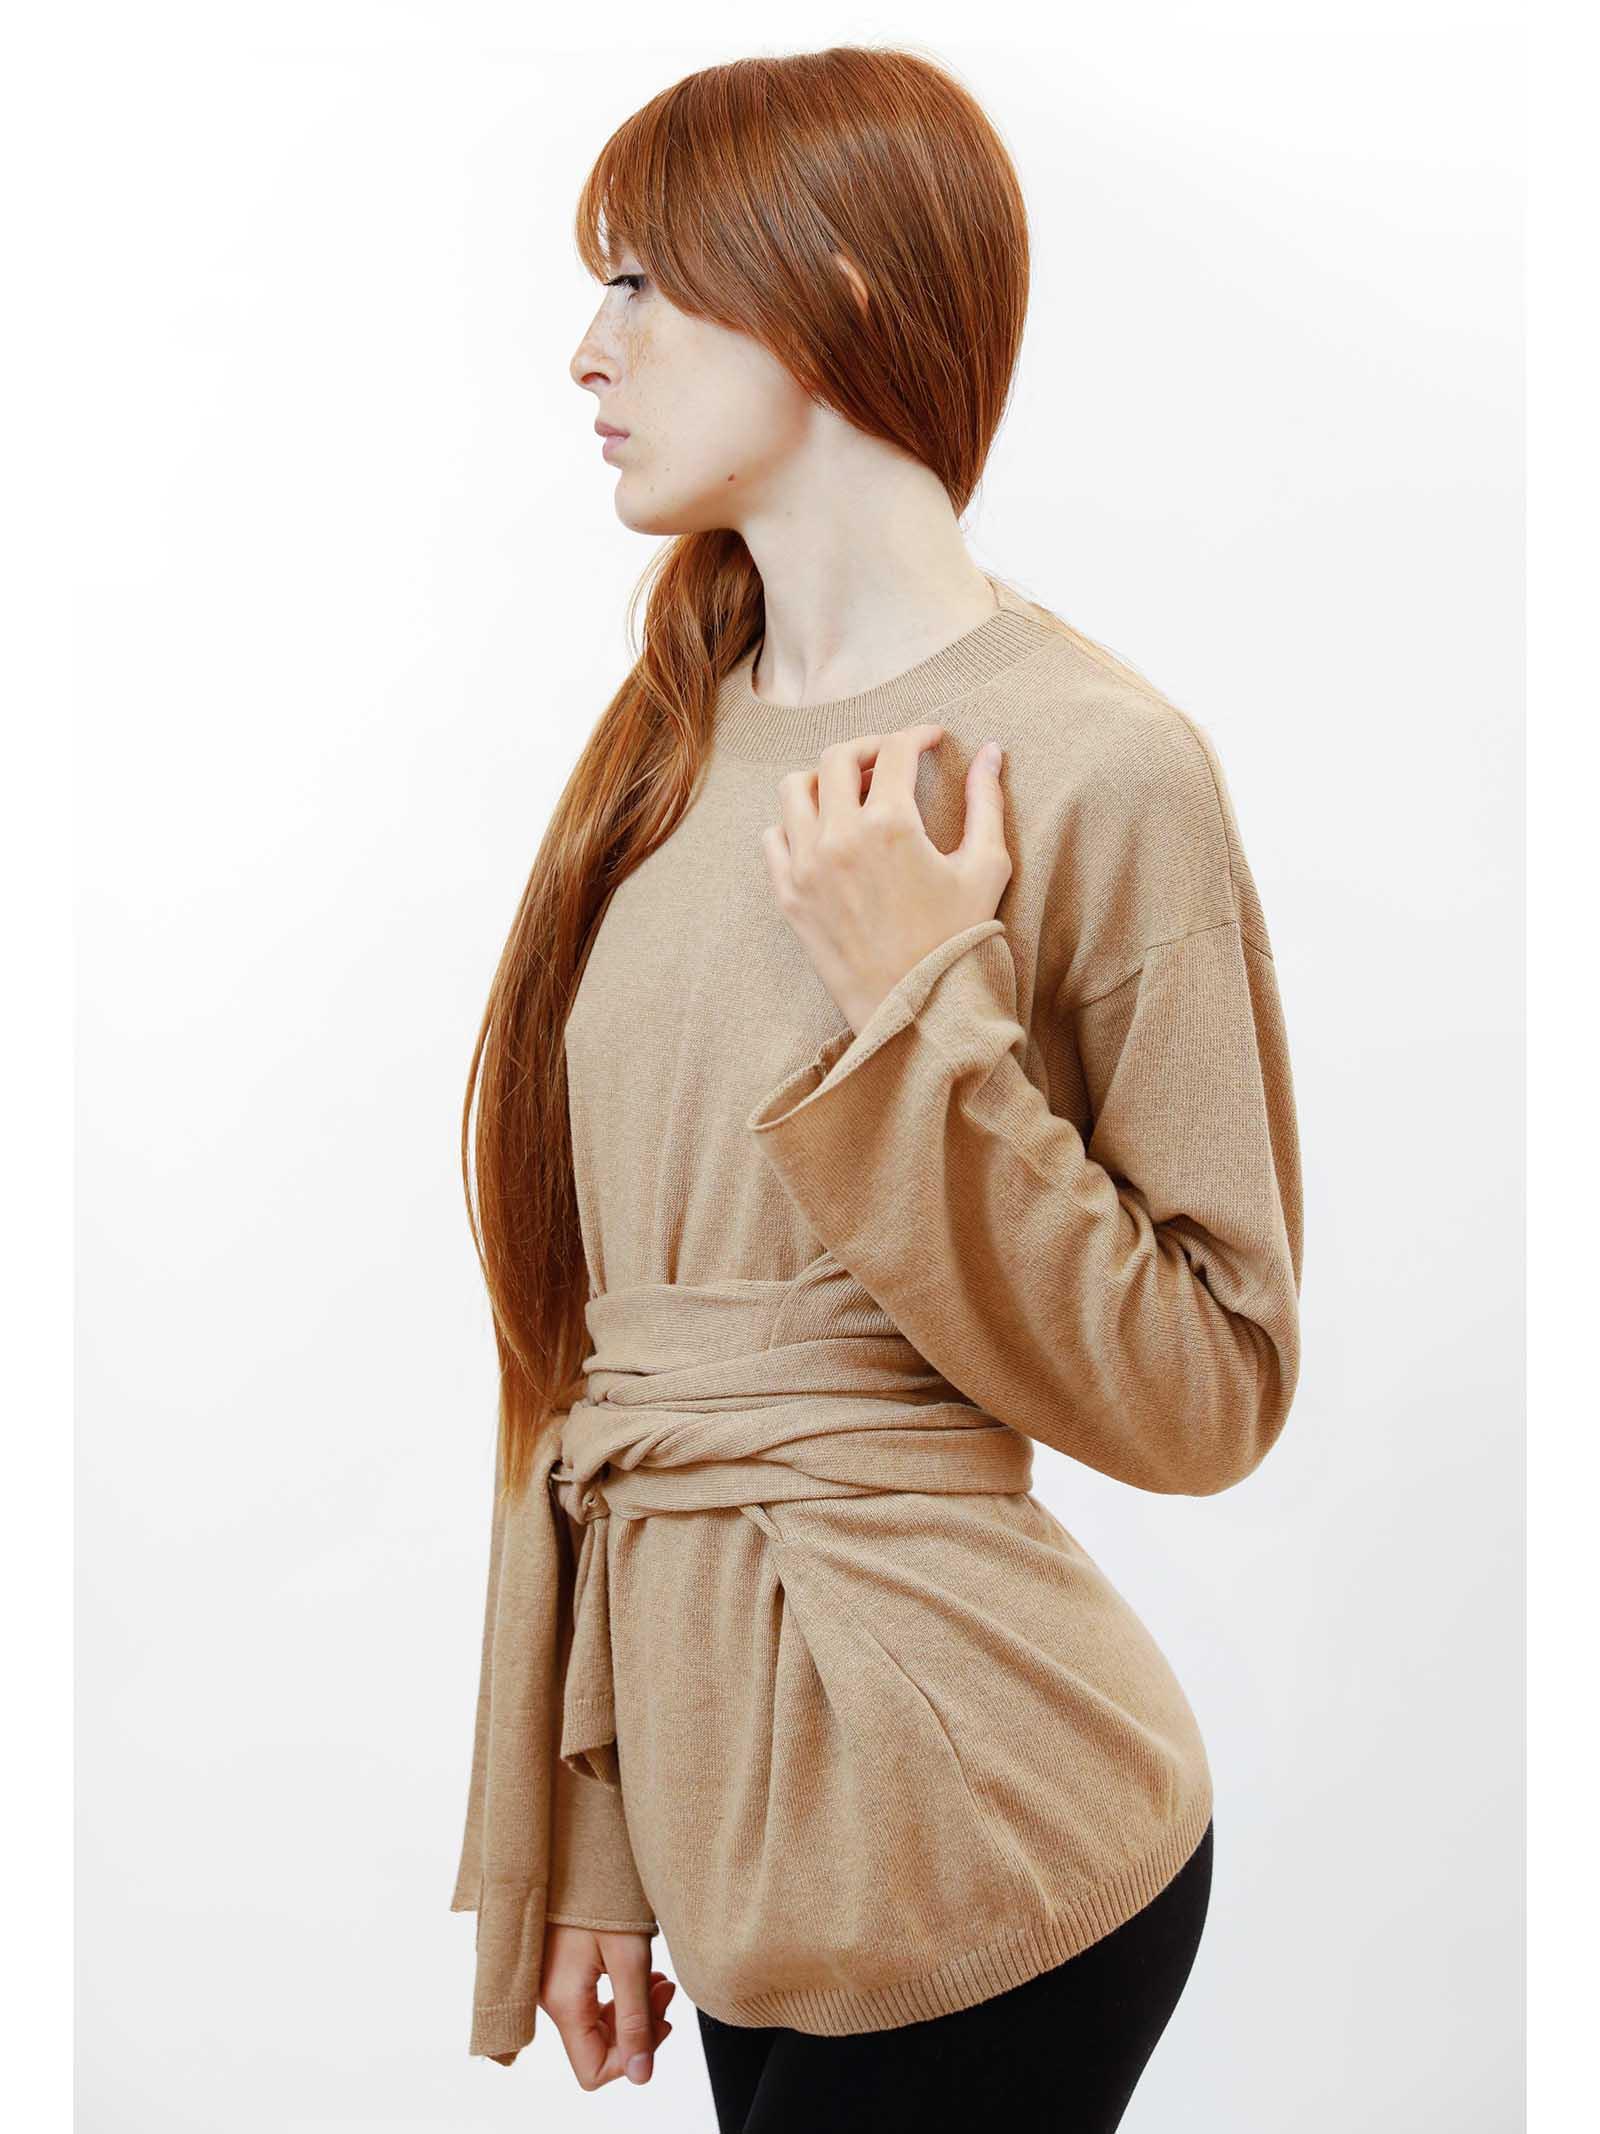 Women's Clothing Re-volution Sweater in Beige Wool Crew-Neck with Matching Waist Belt Maliparmi | Knitwear | JQ48987051812035